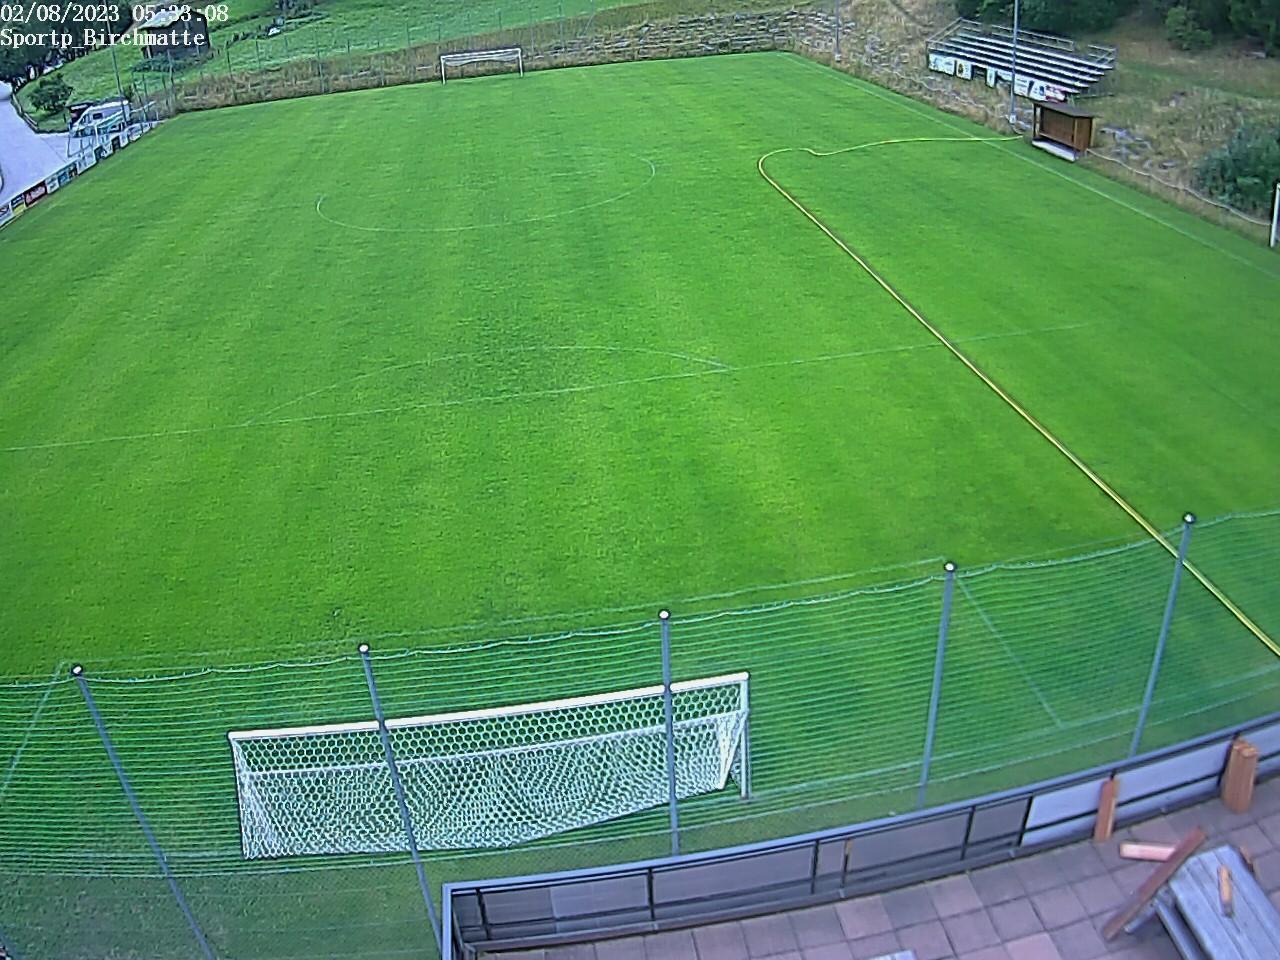 Fussballplatz St.Niklaus. Danke an den FC Zaniglas (www.fczaniglas.ch)